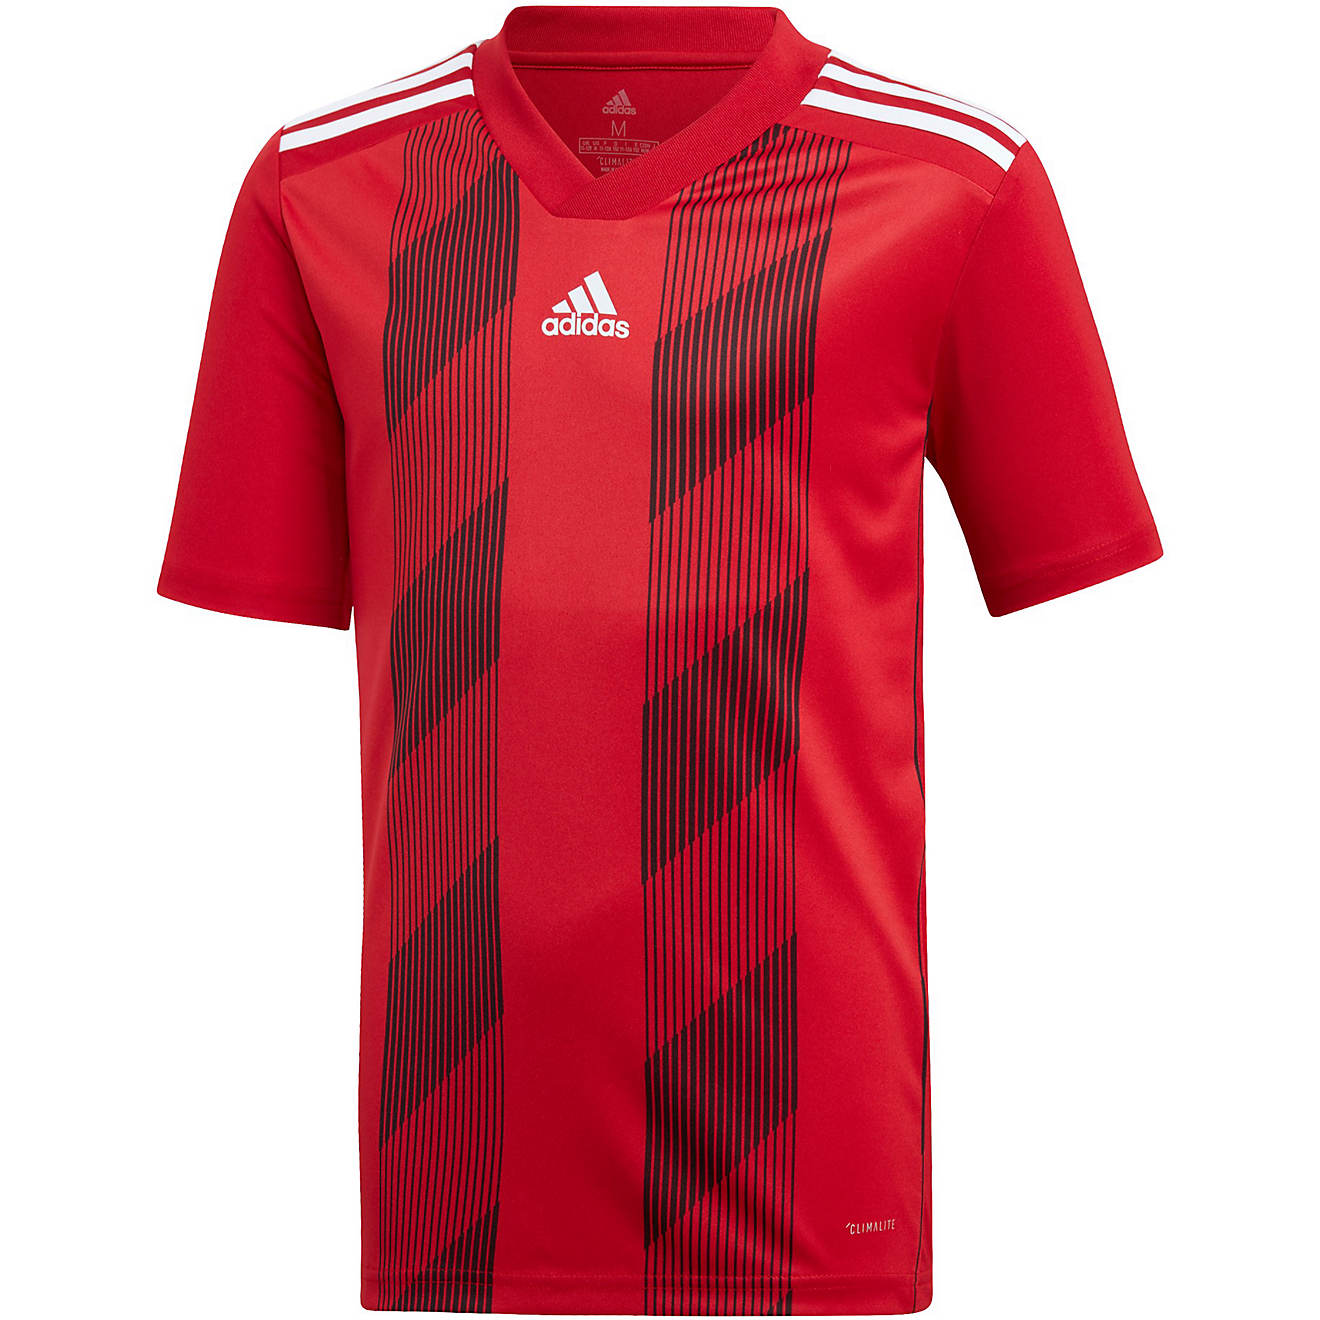 adidas Boys' Striped Soccer Jersey | Academy